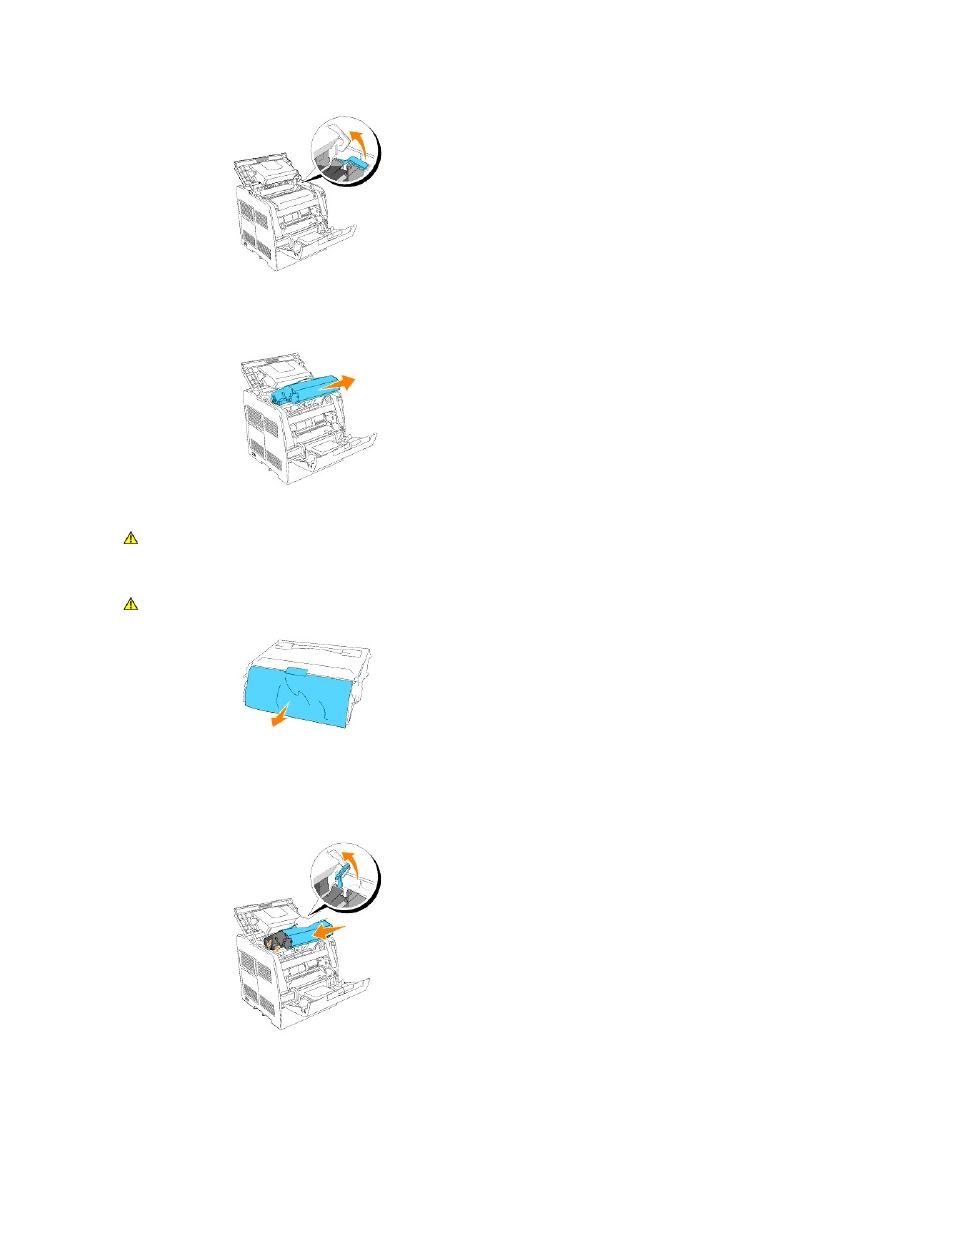 dell 3100cn color laser printer user manual page 83 219 rh manualsdir com Dell 3100Cn Drum Cartridge Dell 3100Cn Specs